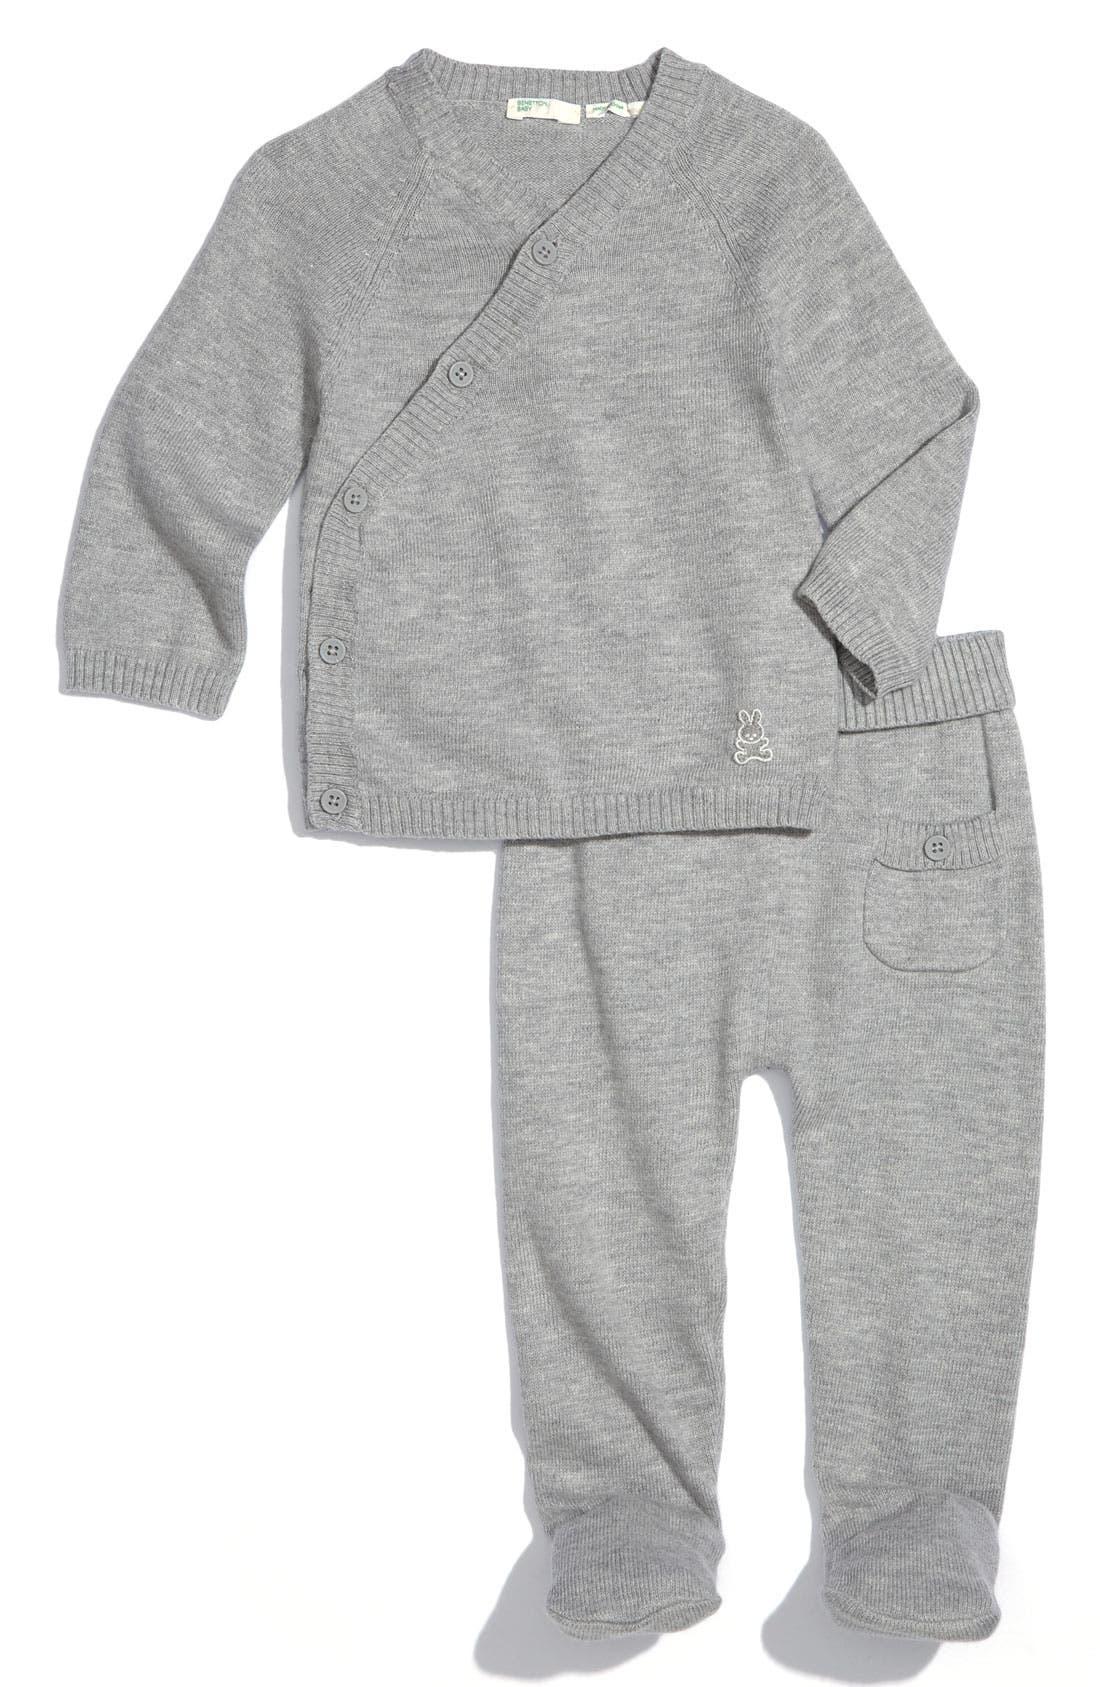 Alternate Image 1 Selected - United Colors of Benetton Kids Shirt & Pants Set (Infant)